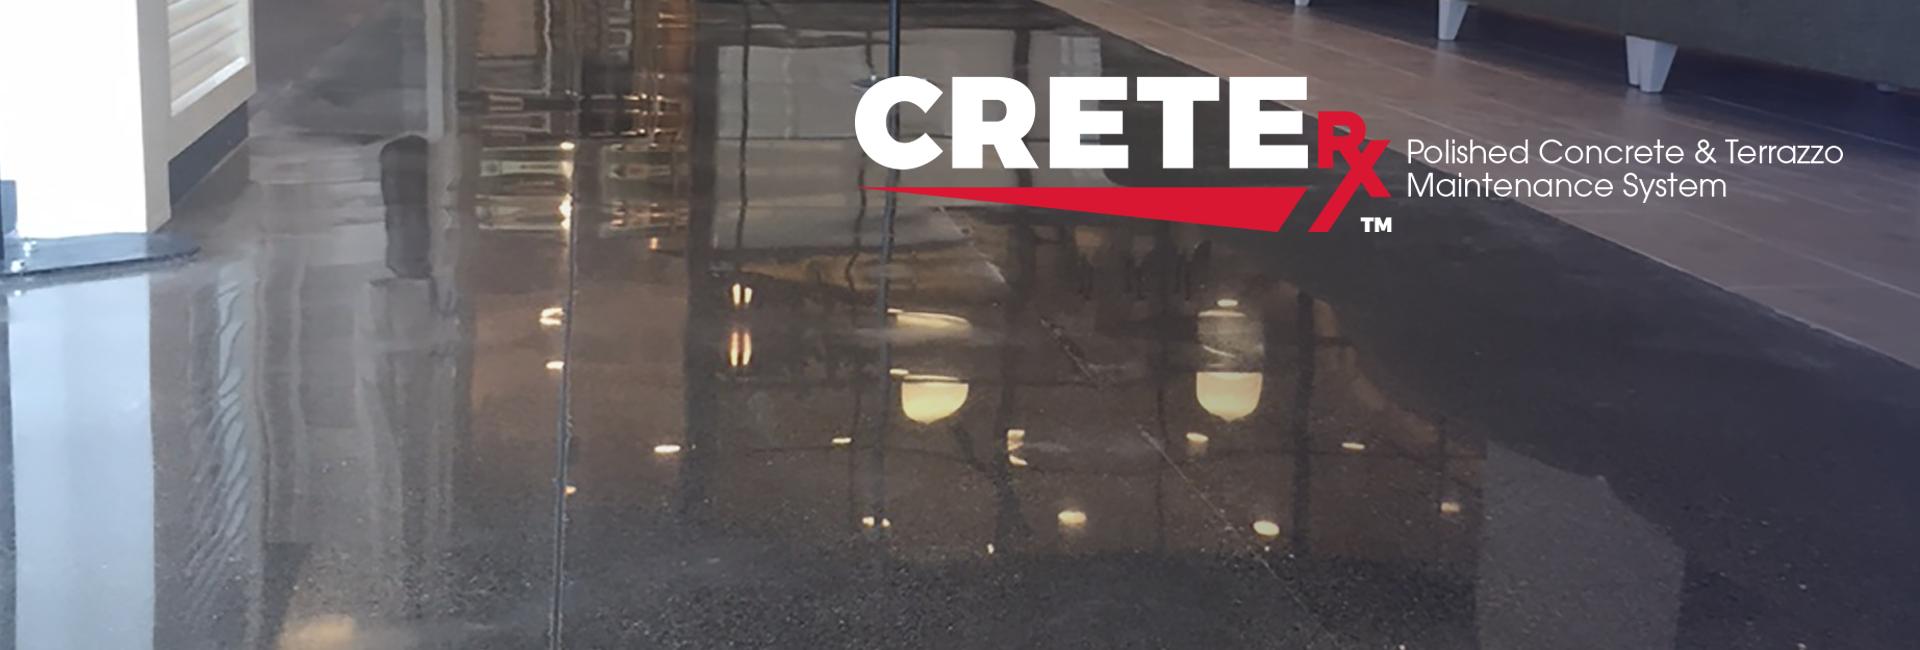 CreteRx_masthead_1920x650